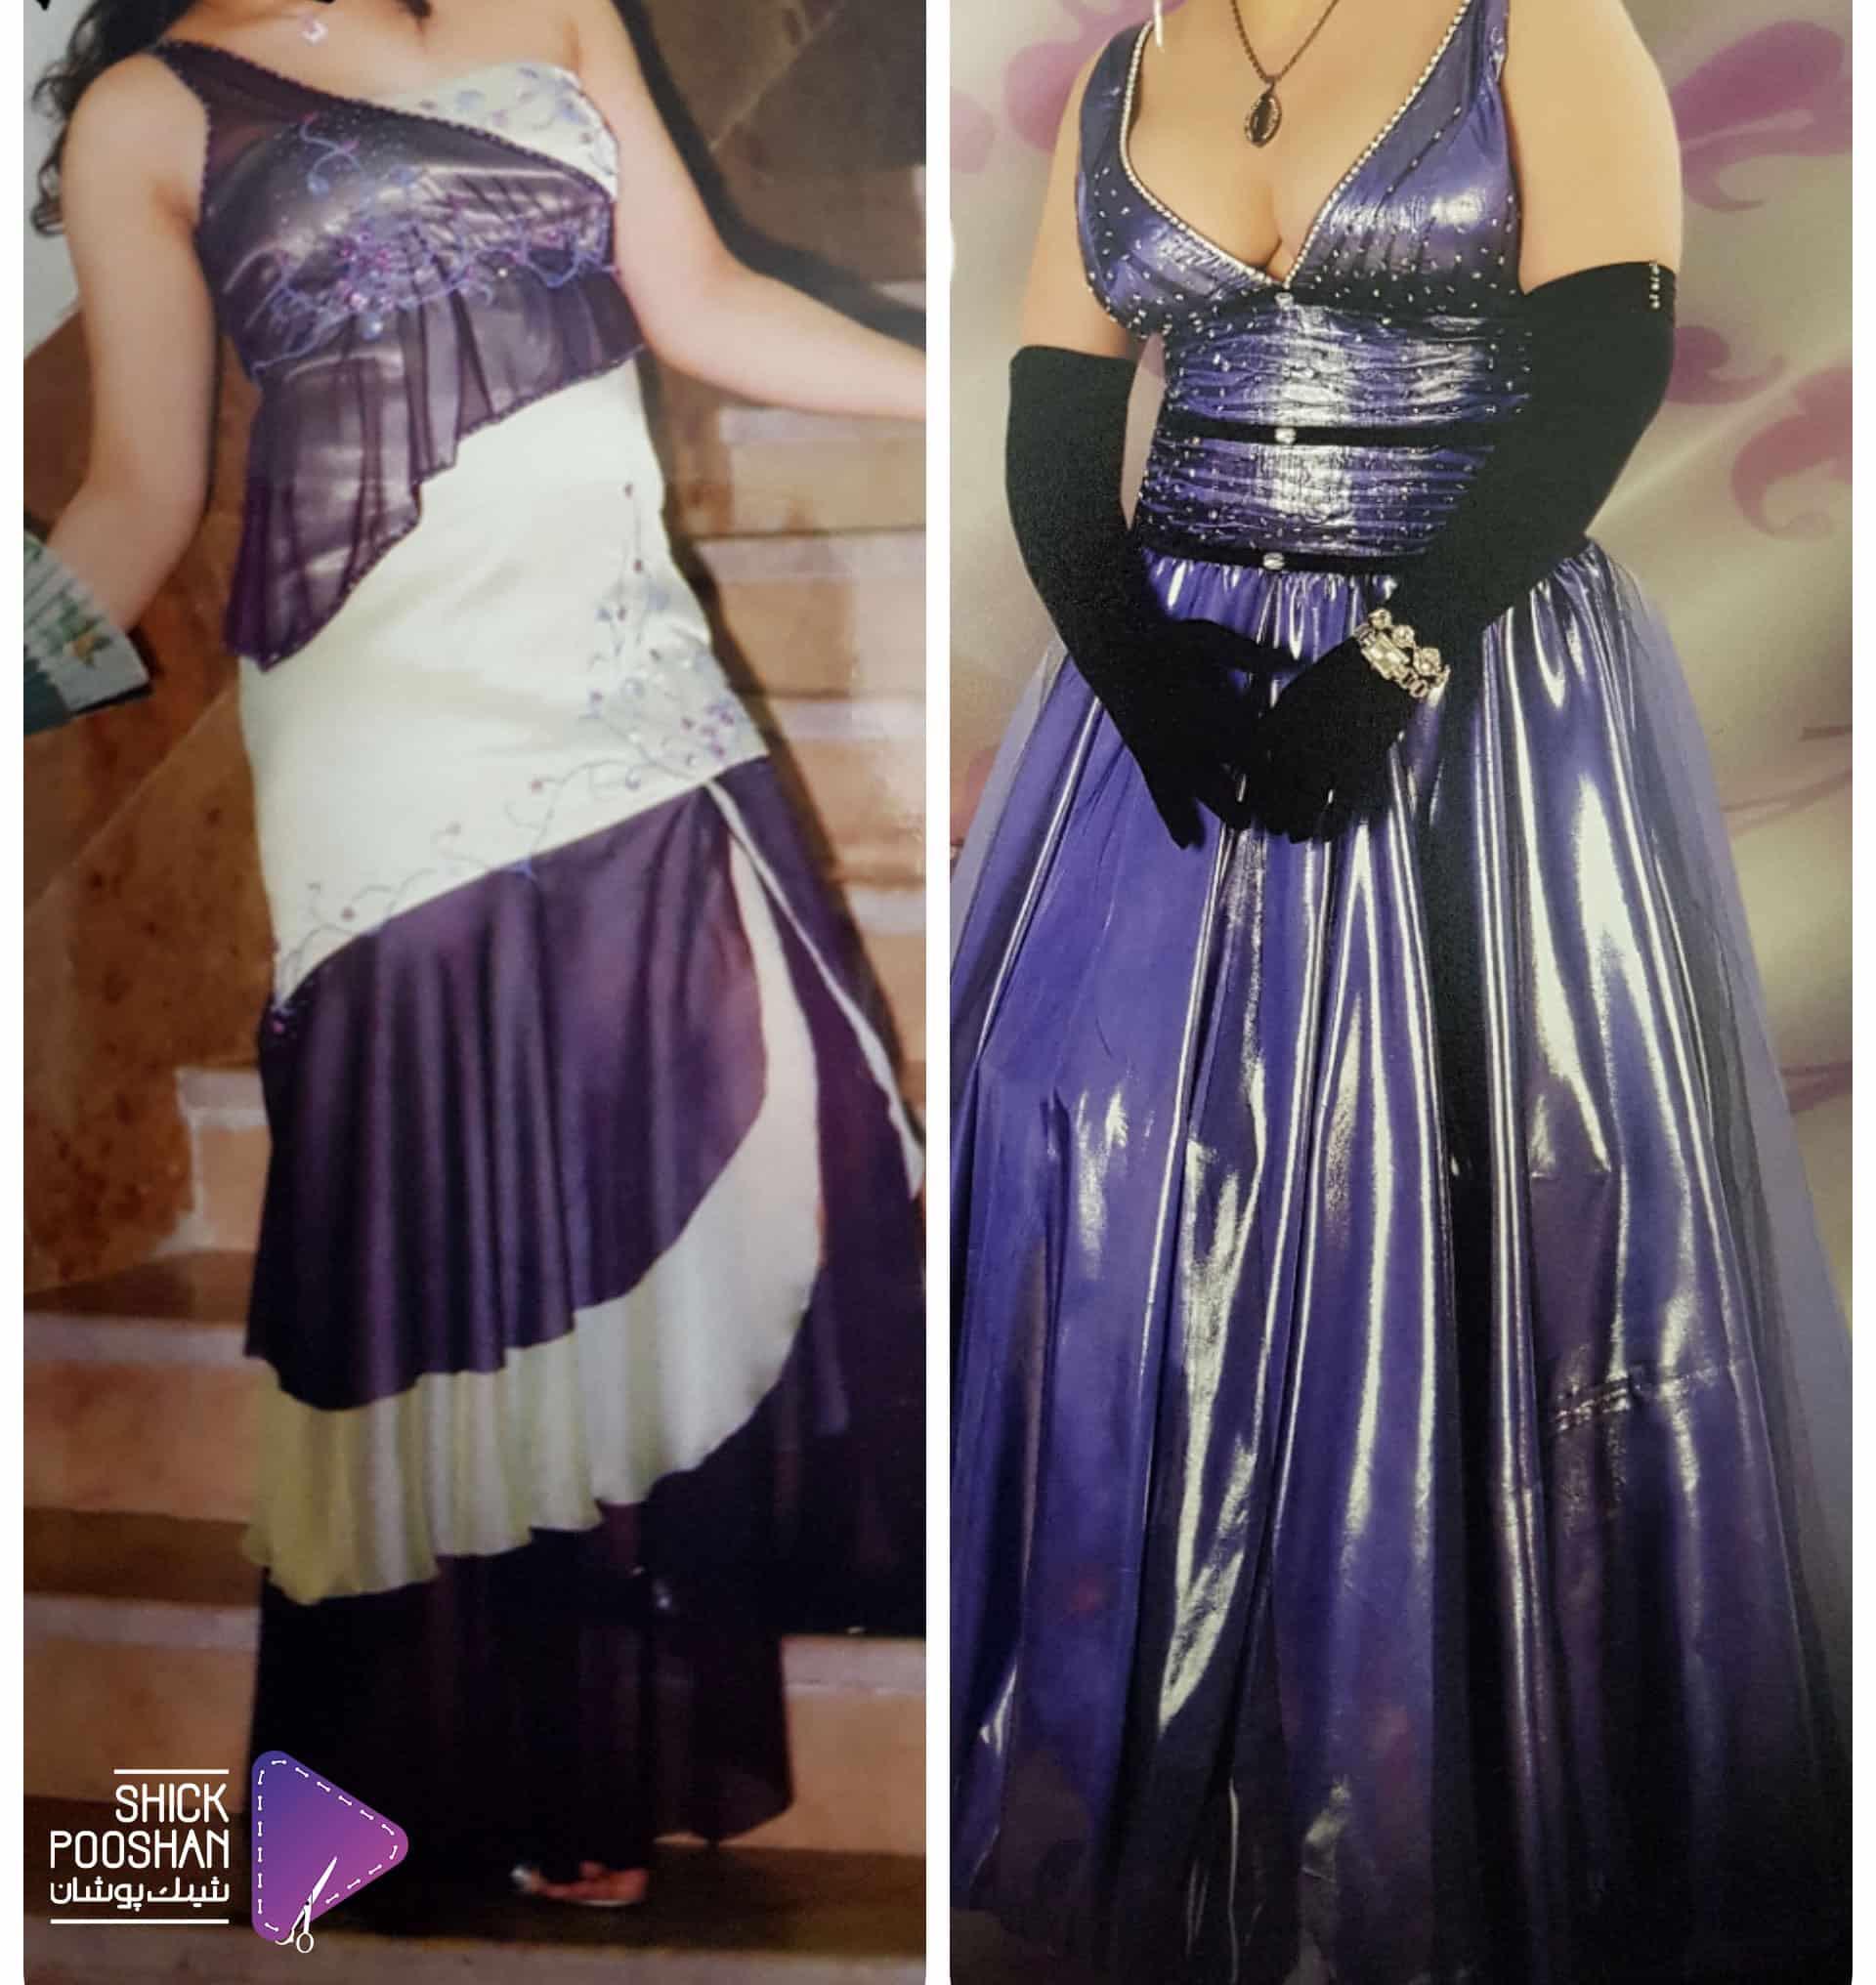 نمونه دوخت لباس شب